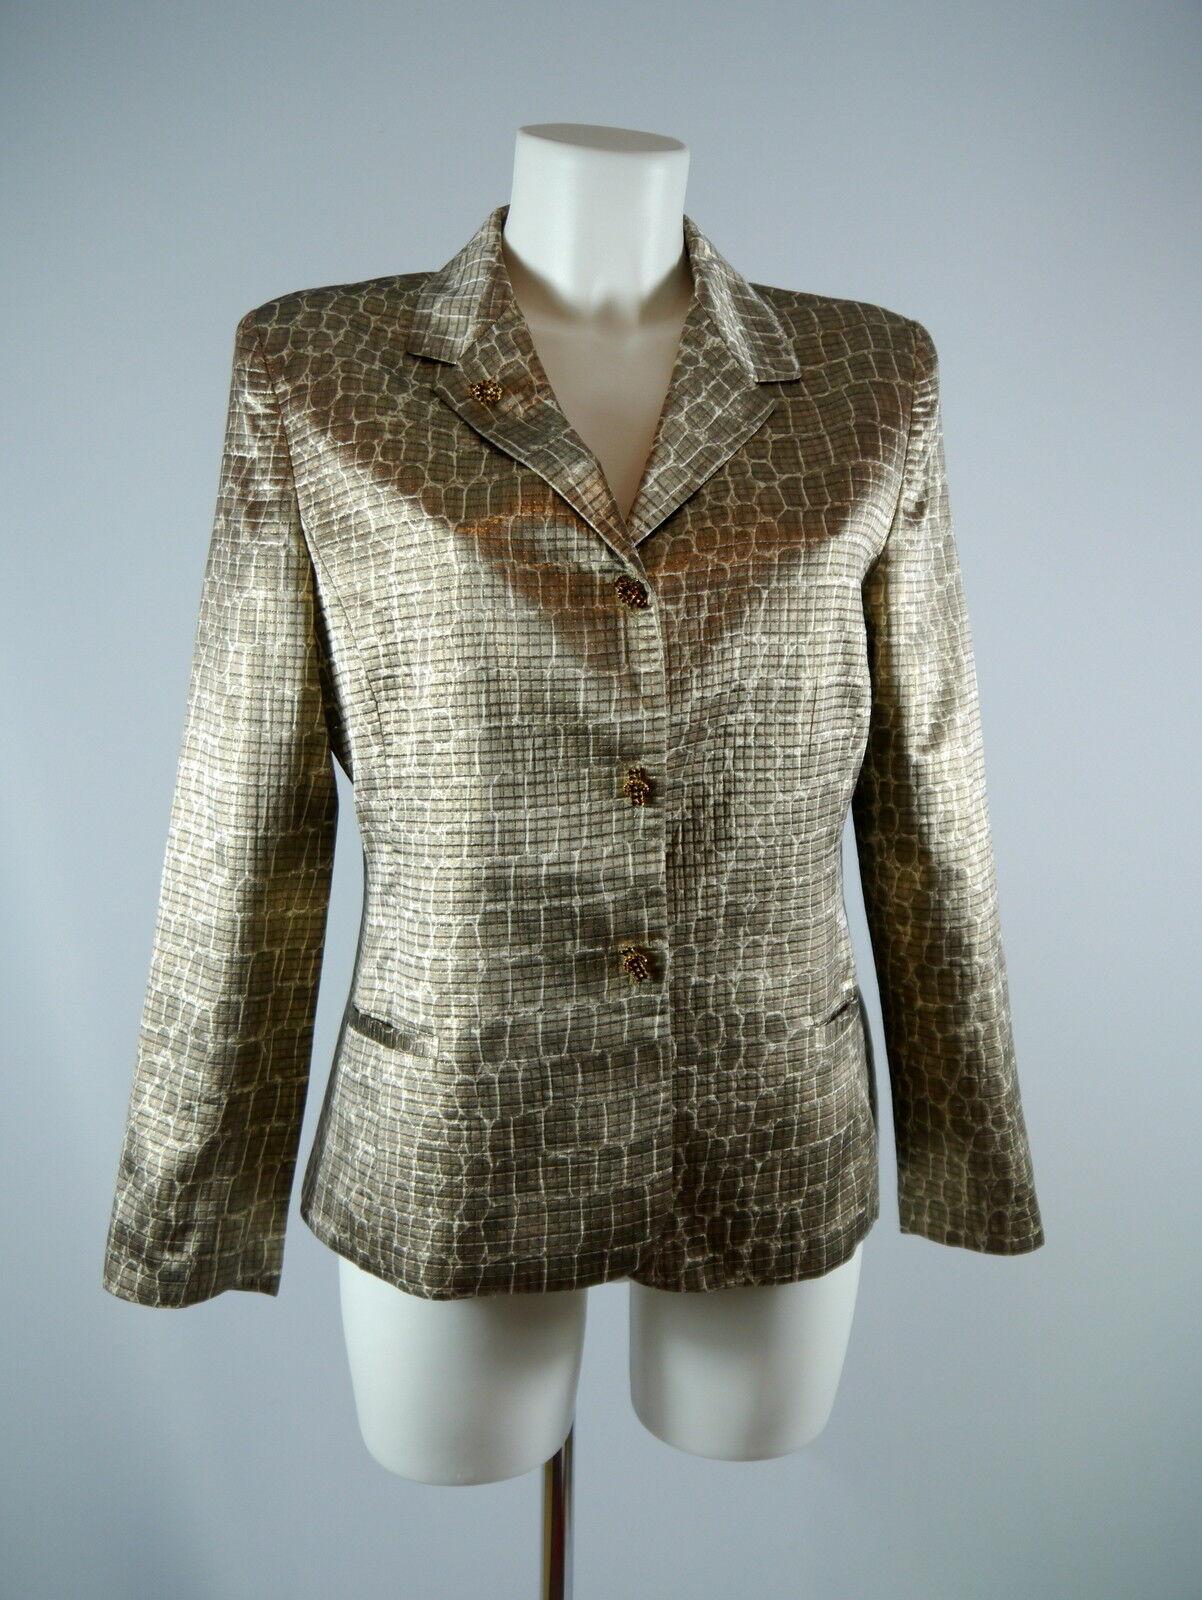 Edler Roberto Verino Da. Seiden Blazer mit Snakeskin Print in Gold Gr. 40 TOP